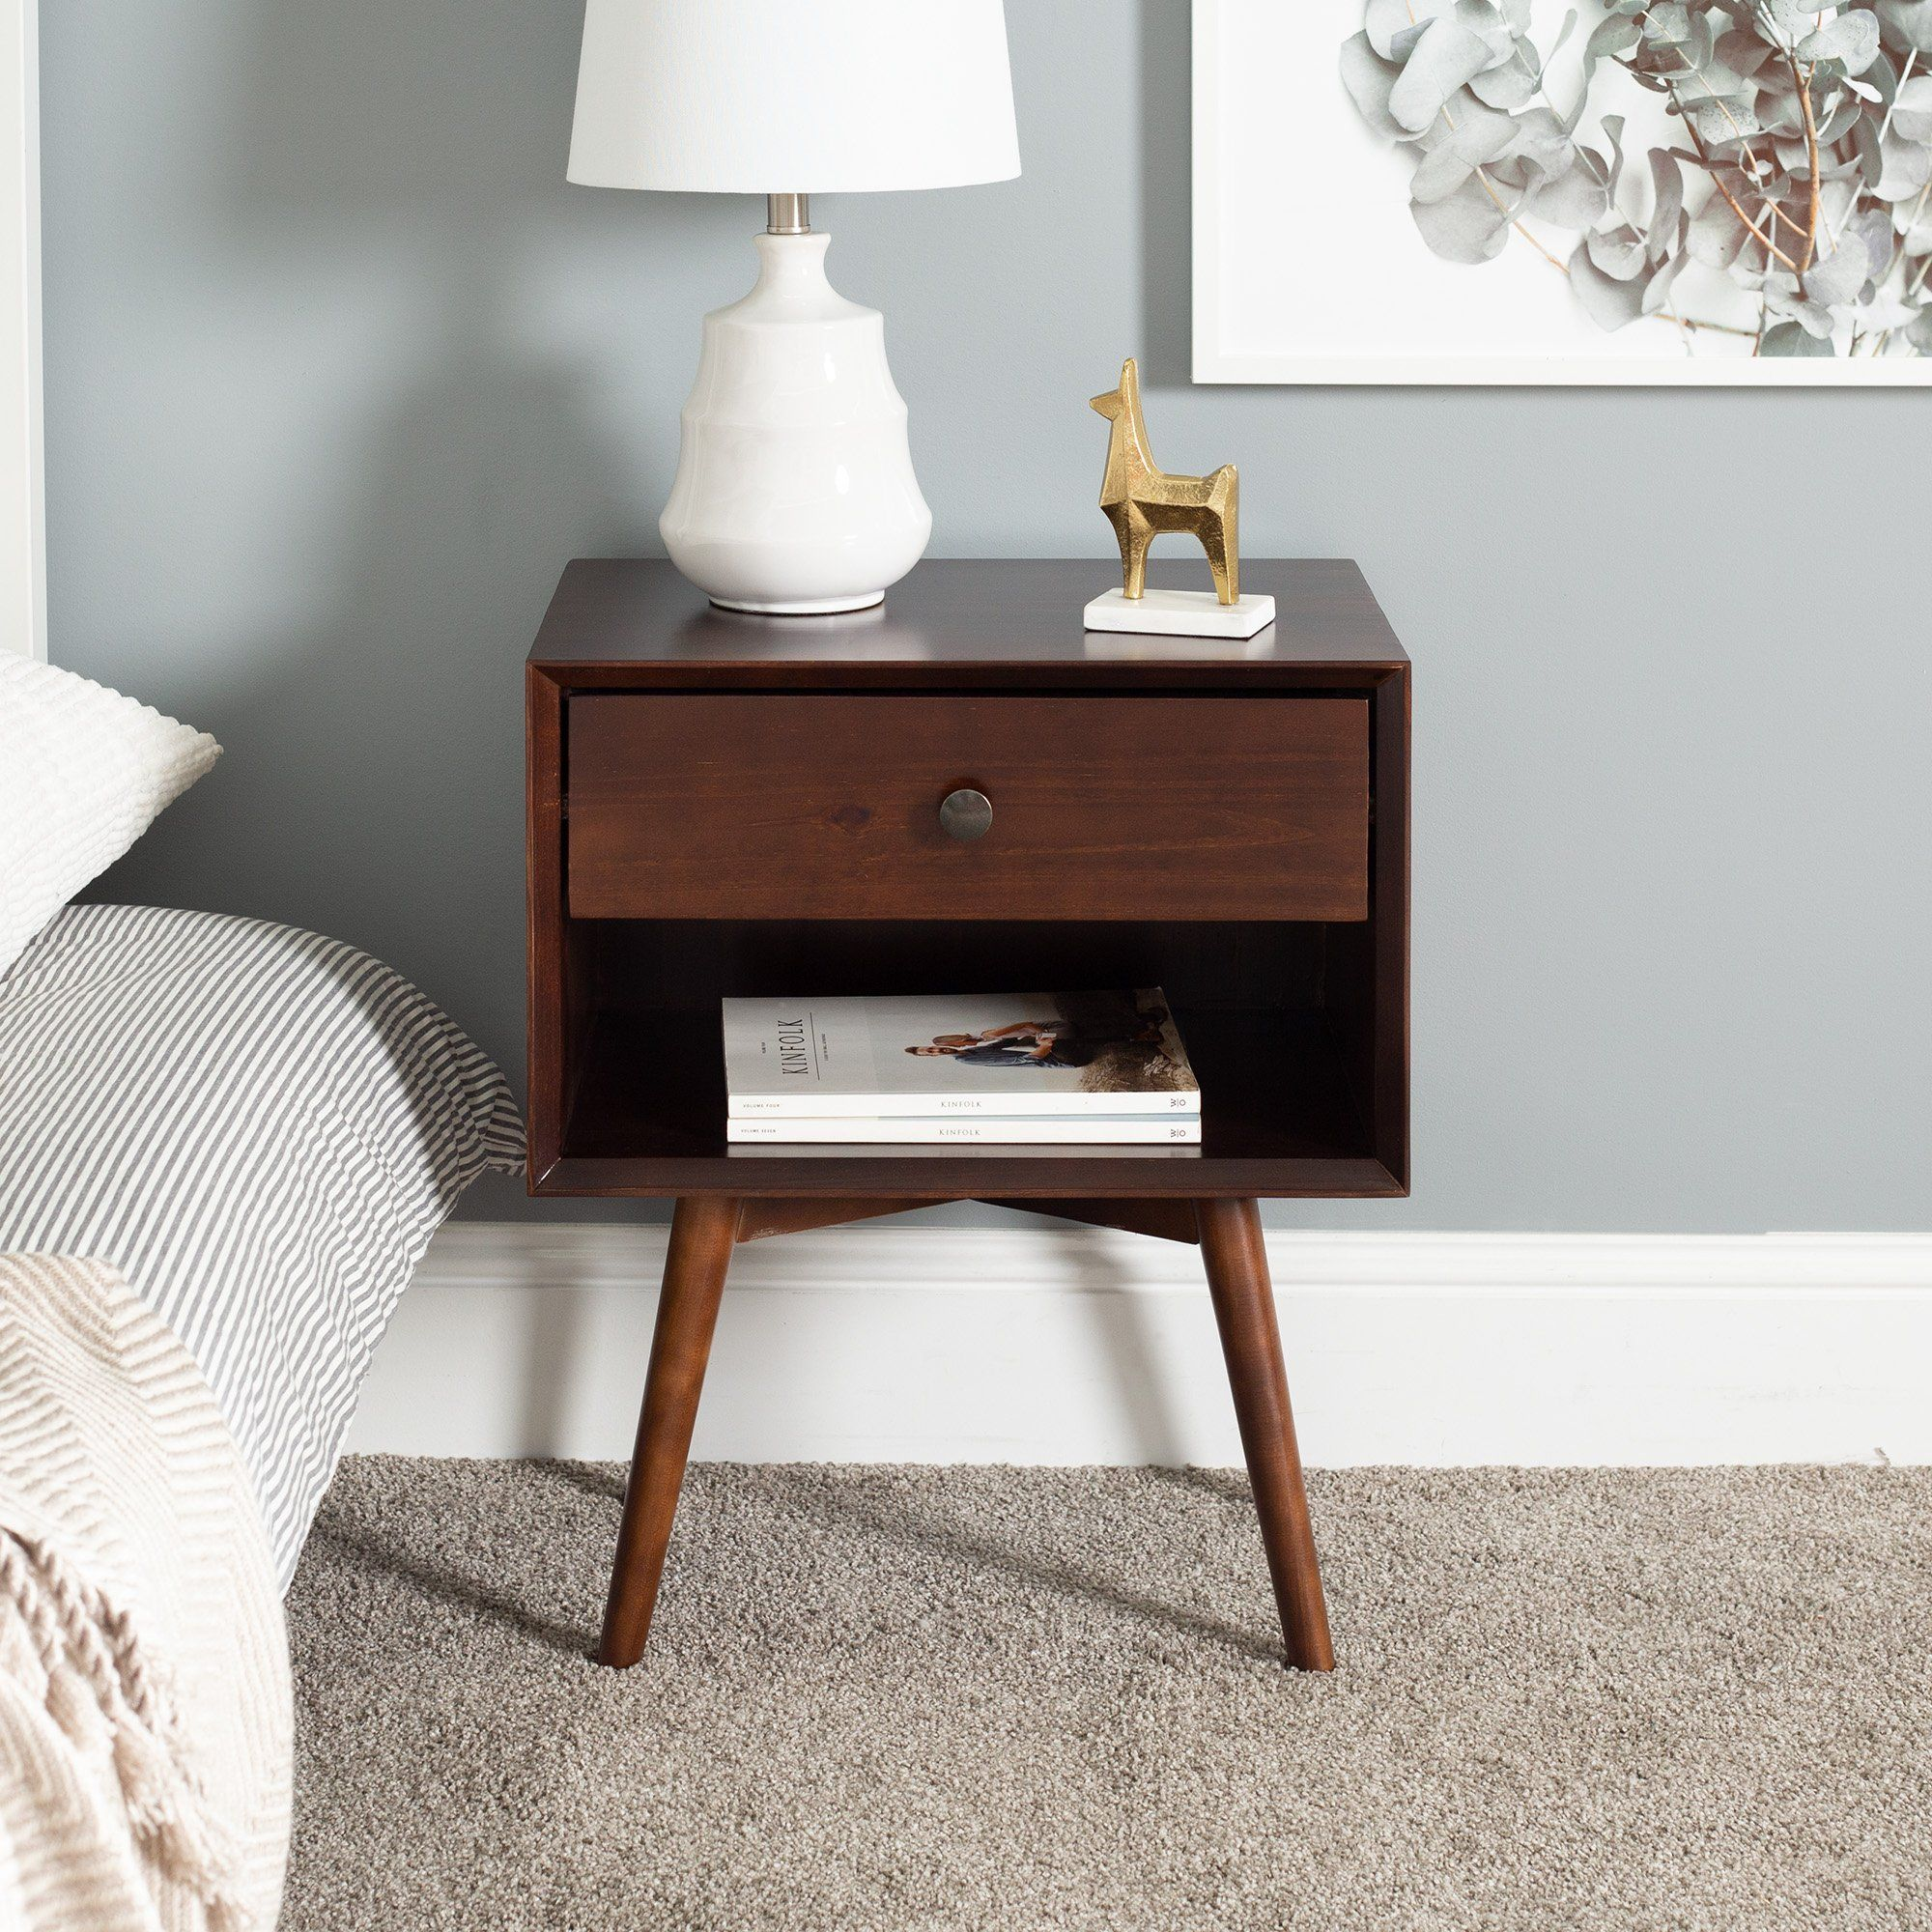 Mid Century 1 Drawer Solid Wood Nightstand In 2021 Wood Nightstand Mid Century Modern Wood Mid Century Modern Nightstand